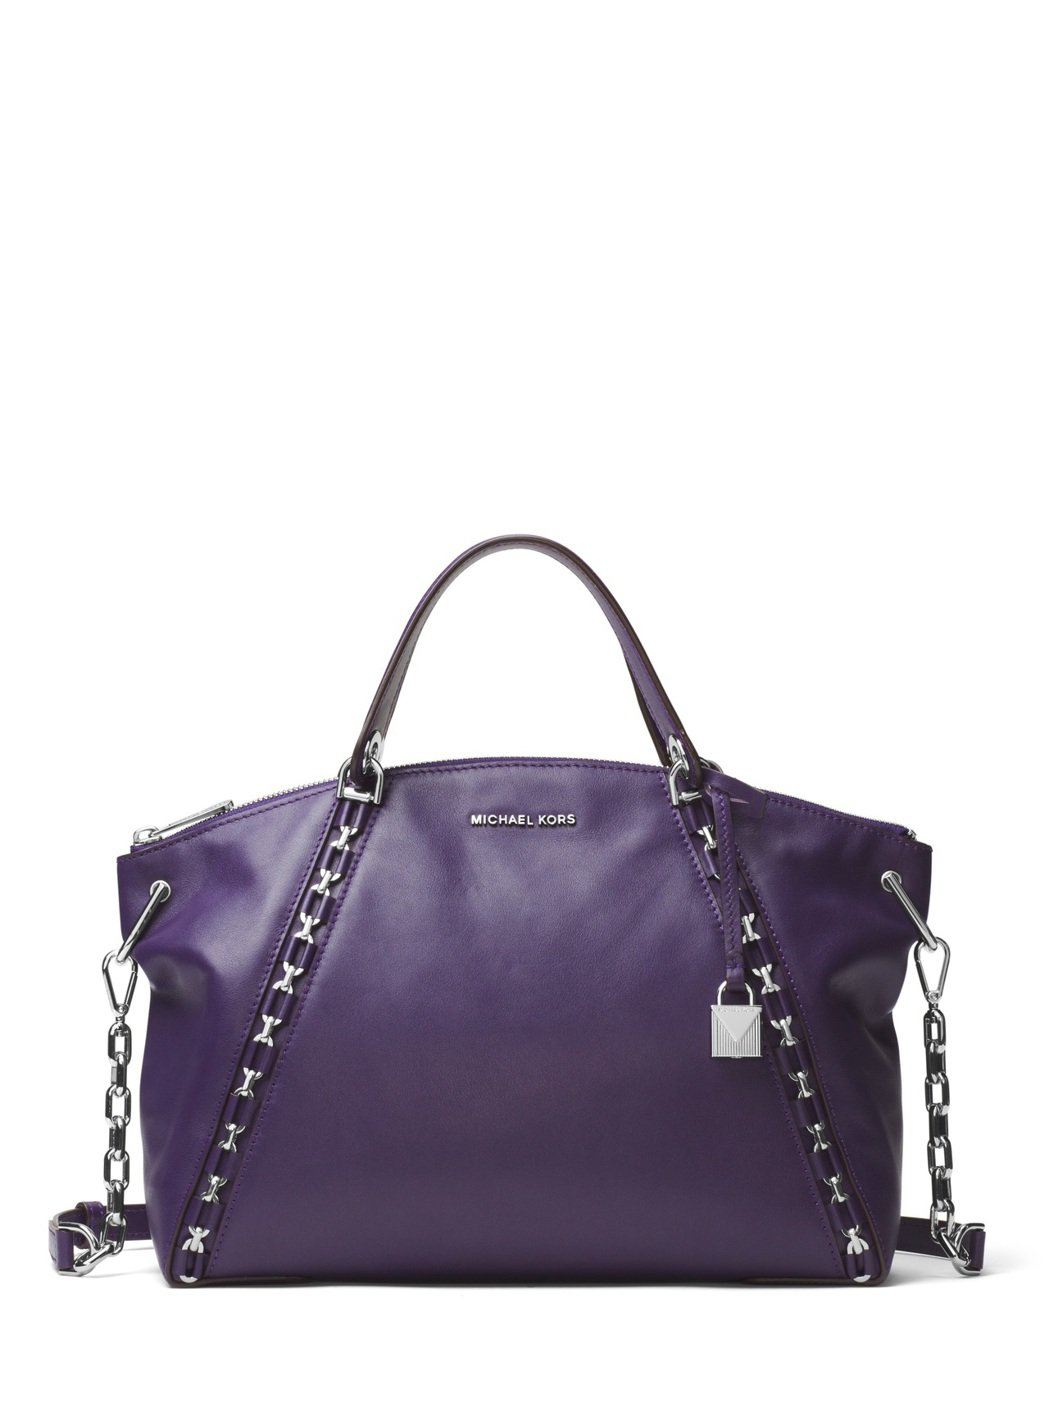 SADIE鳶尾紫提包,售價21,700元。圖/MICHAEL KORS提供